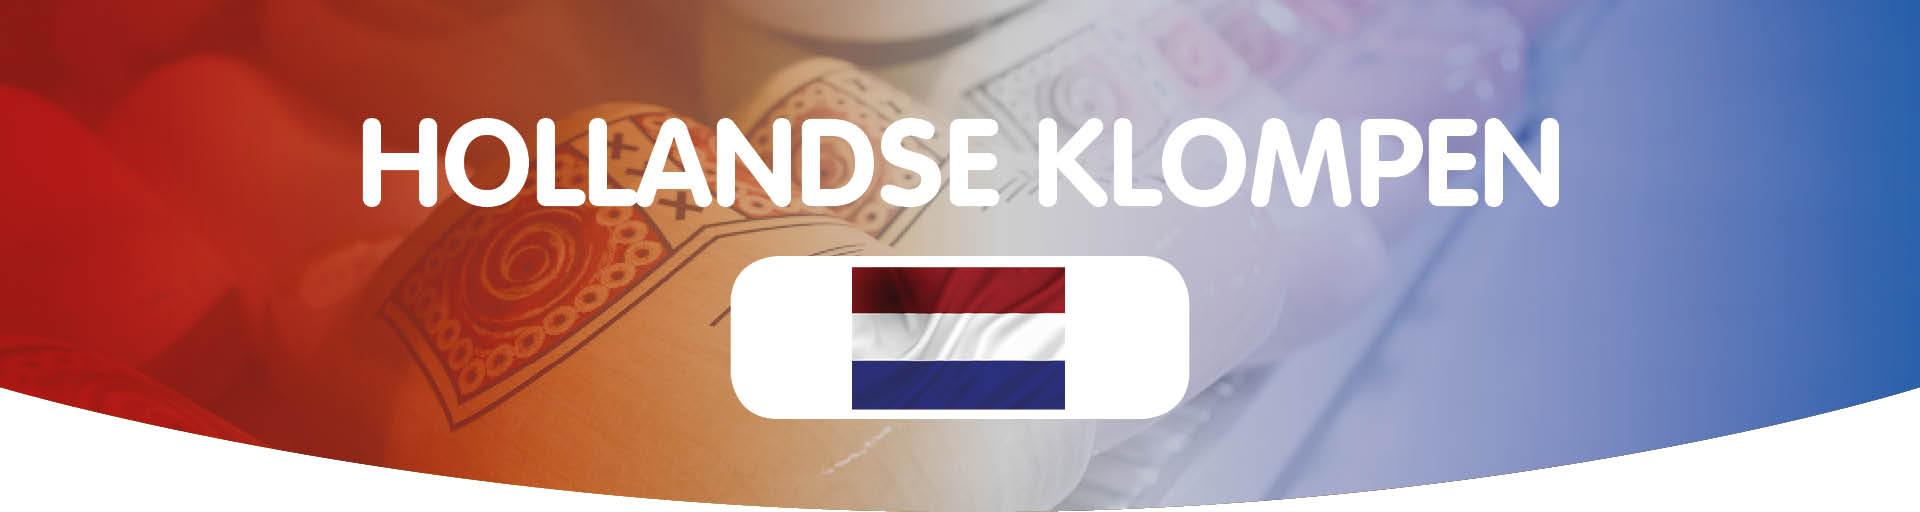 Hollandse klomp